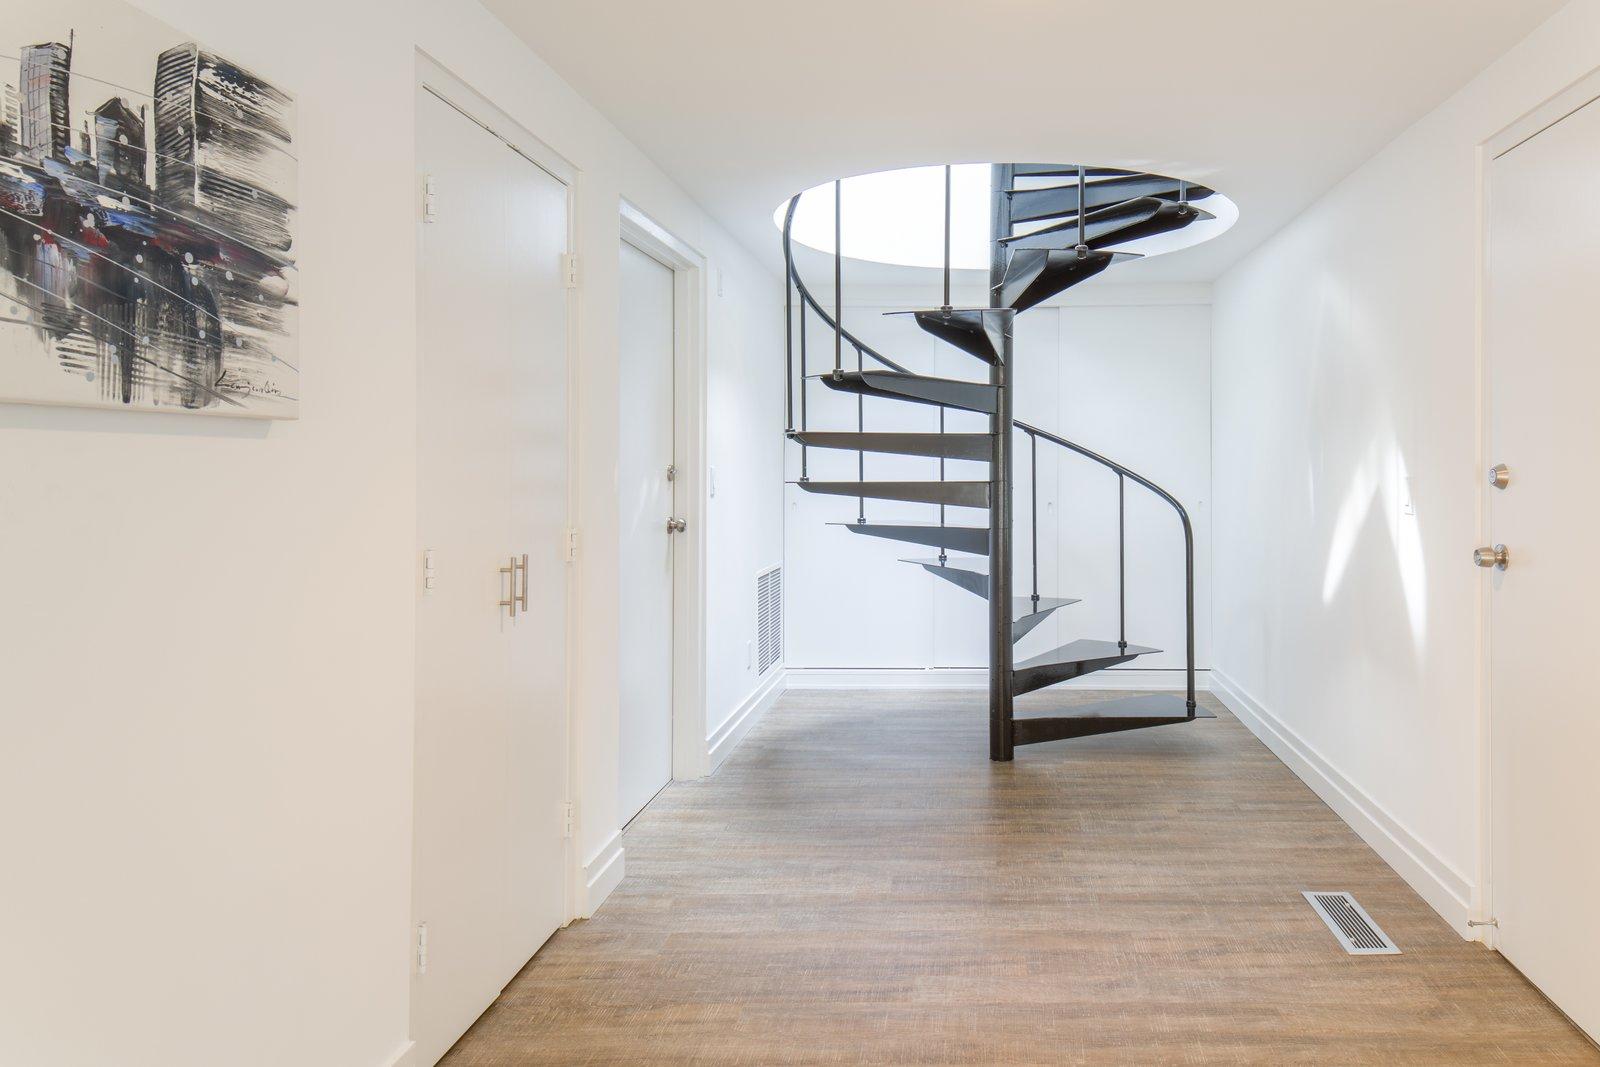 Skidmore, Owings & Merrill midcentury home spiral staircase